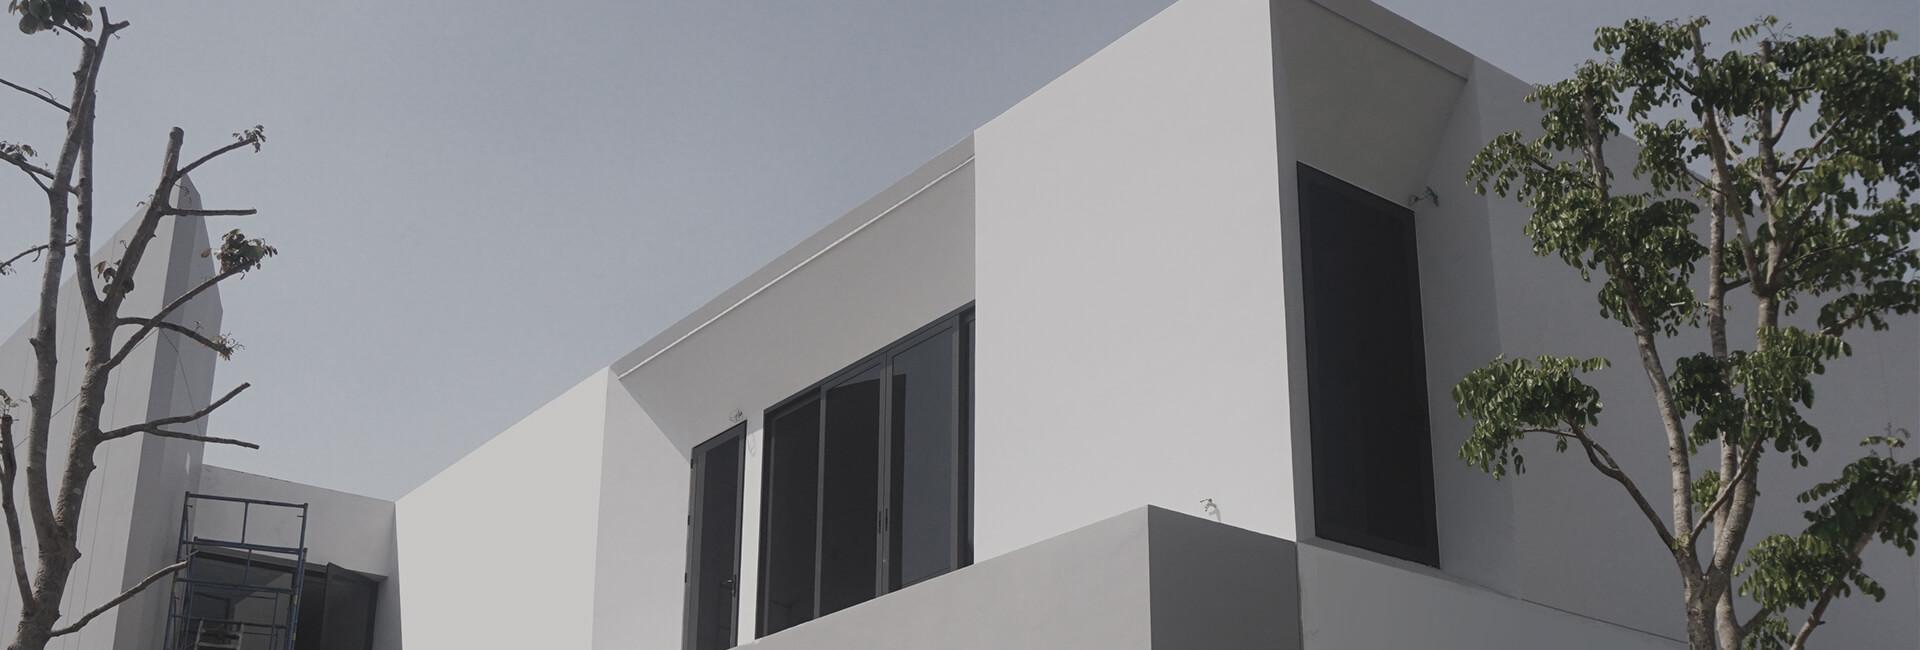 building-bg